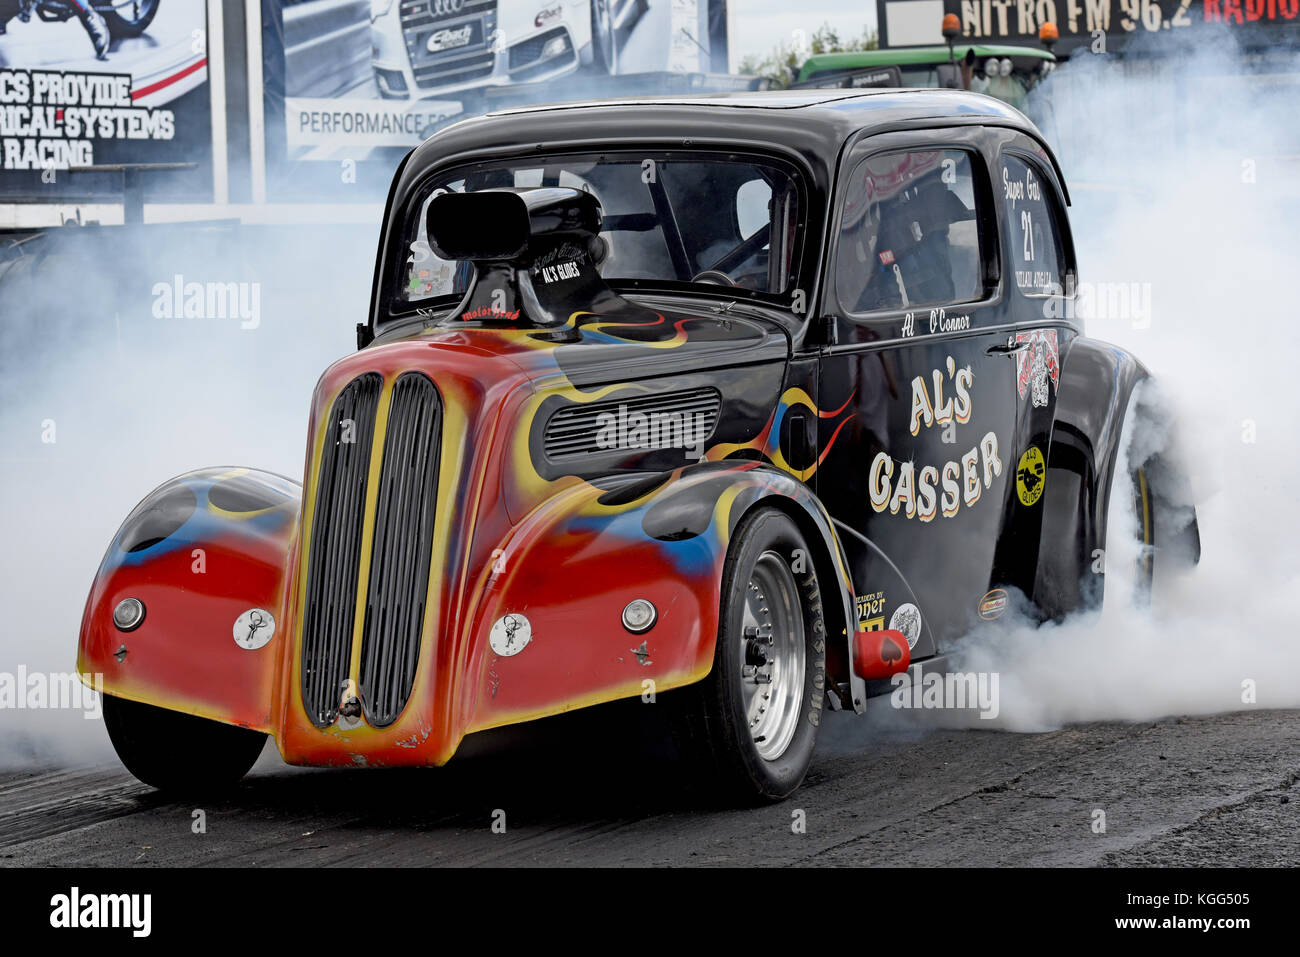 Alan O Connor burn out his Al's Gasser Outlaw Anglia at Santa pod Raceway - Stock Image